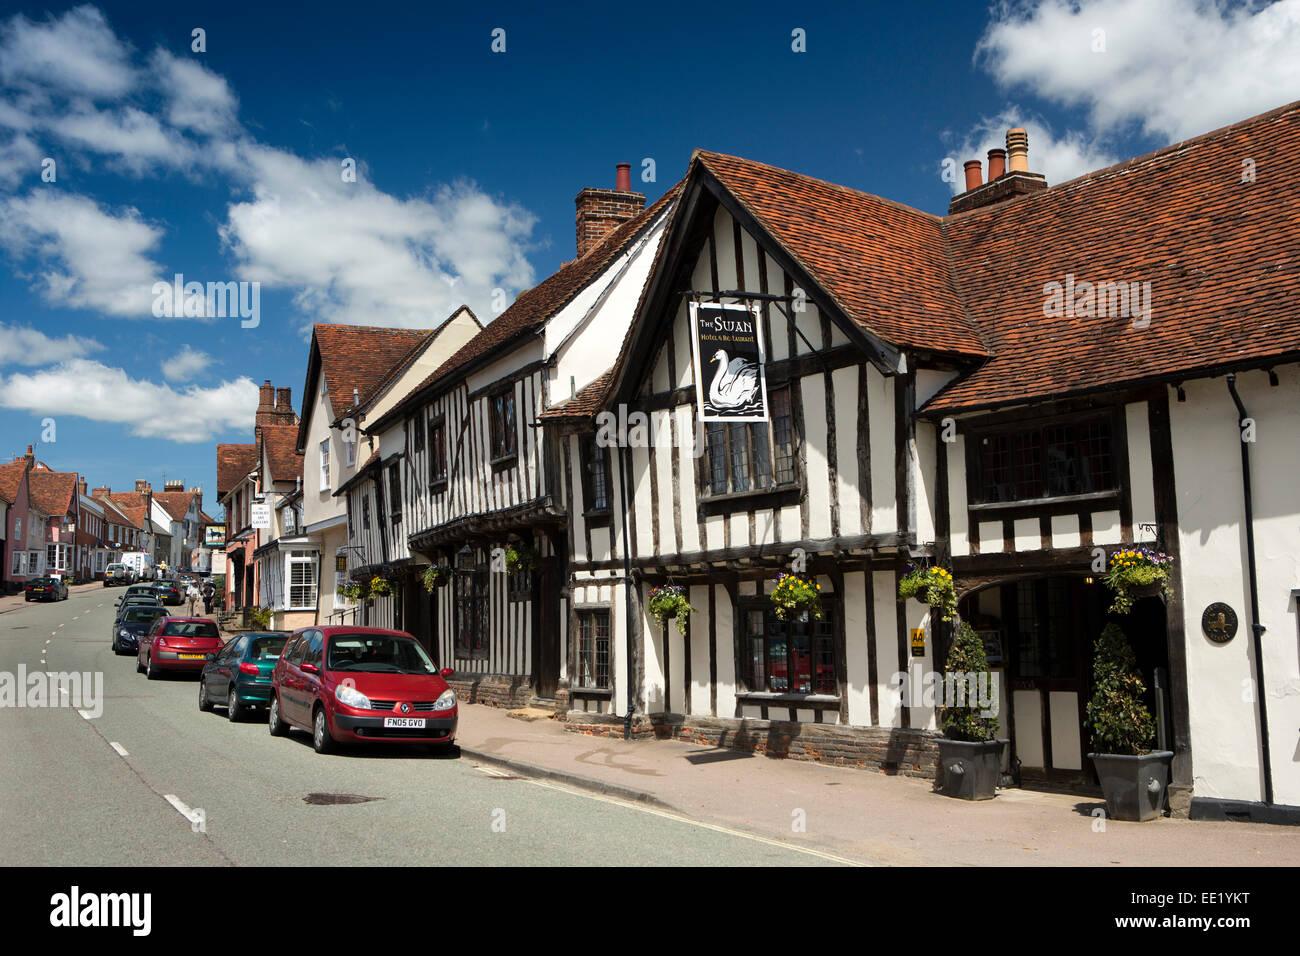 UK England, Suffolk, Lavenham, High Street, The Swan Hotel - Stock Image